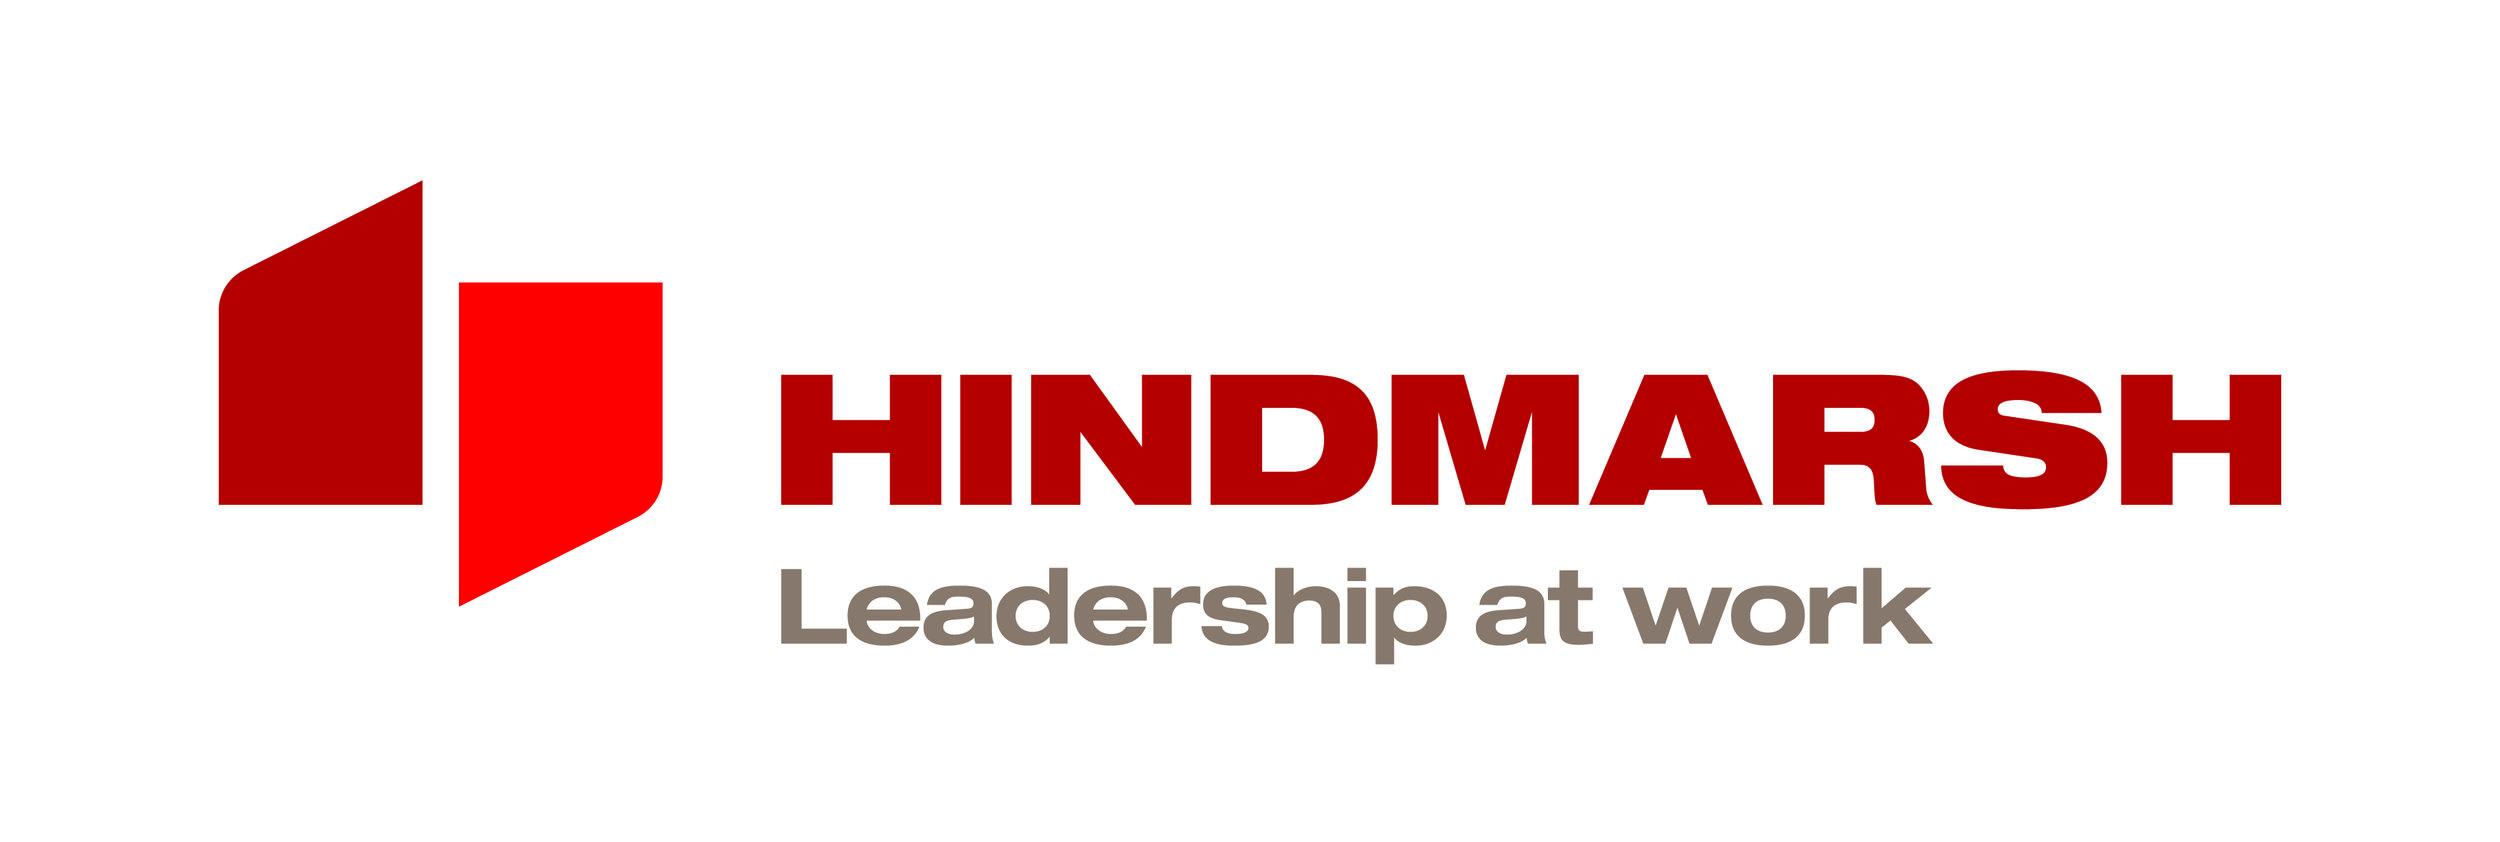 HINDMARSH-LOGO-LRG-CMYK-01.jpg